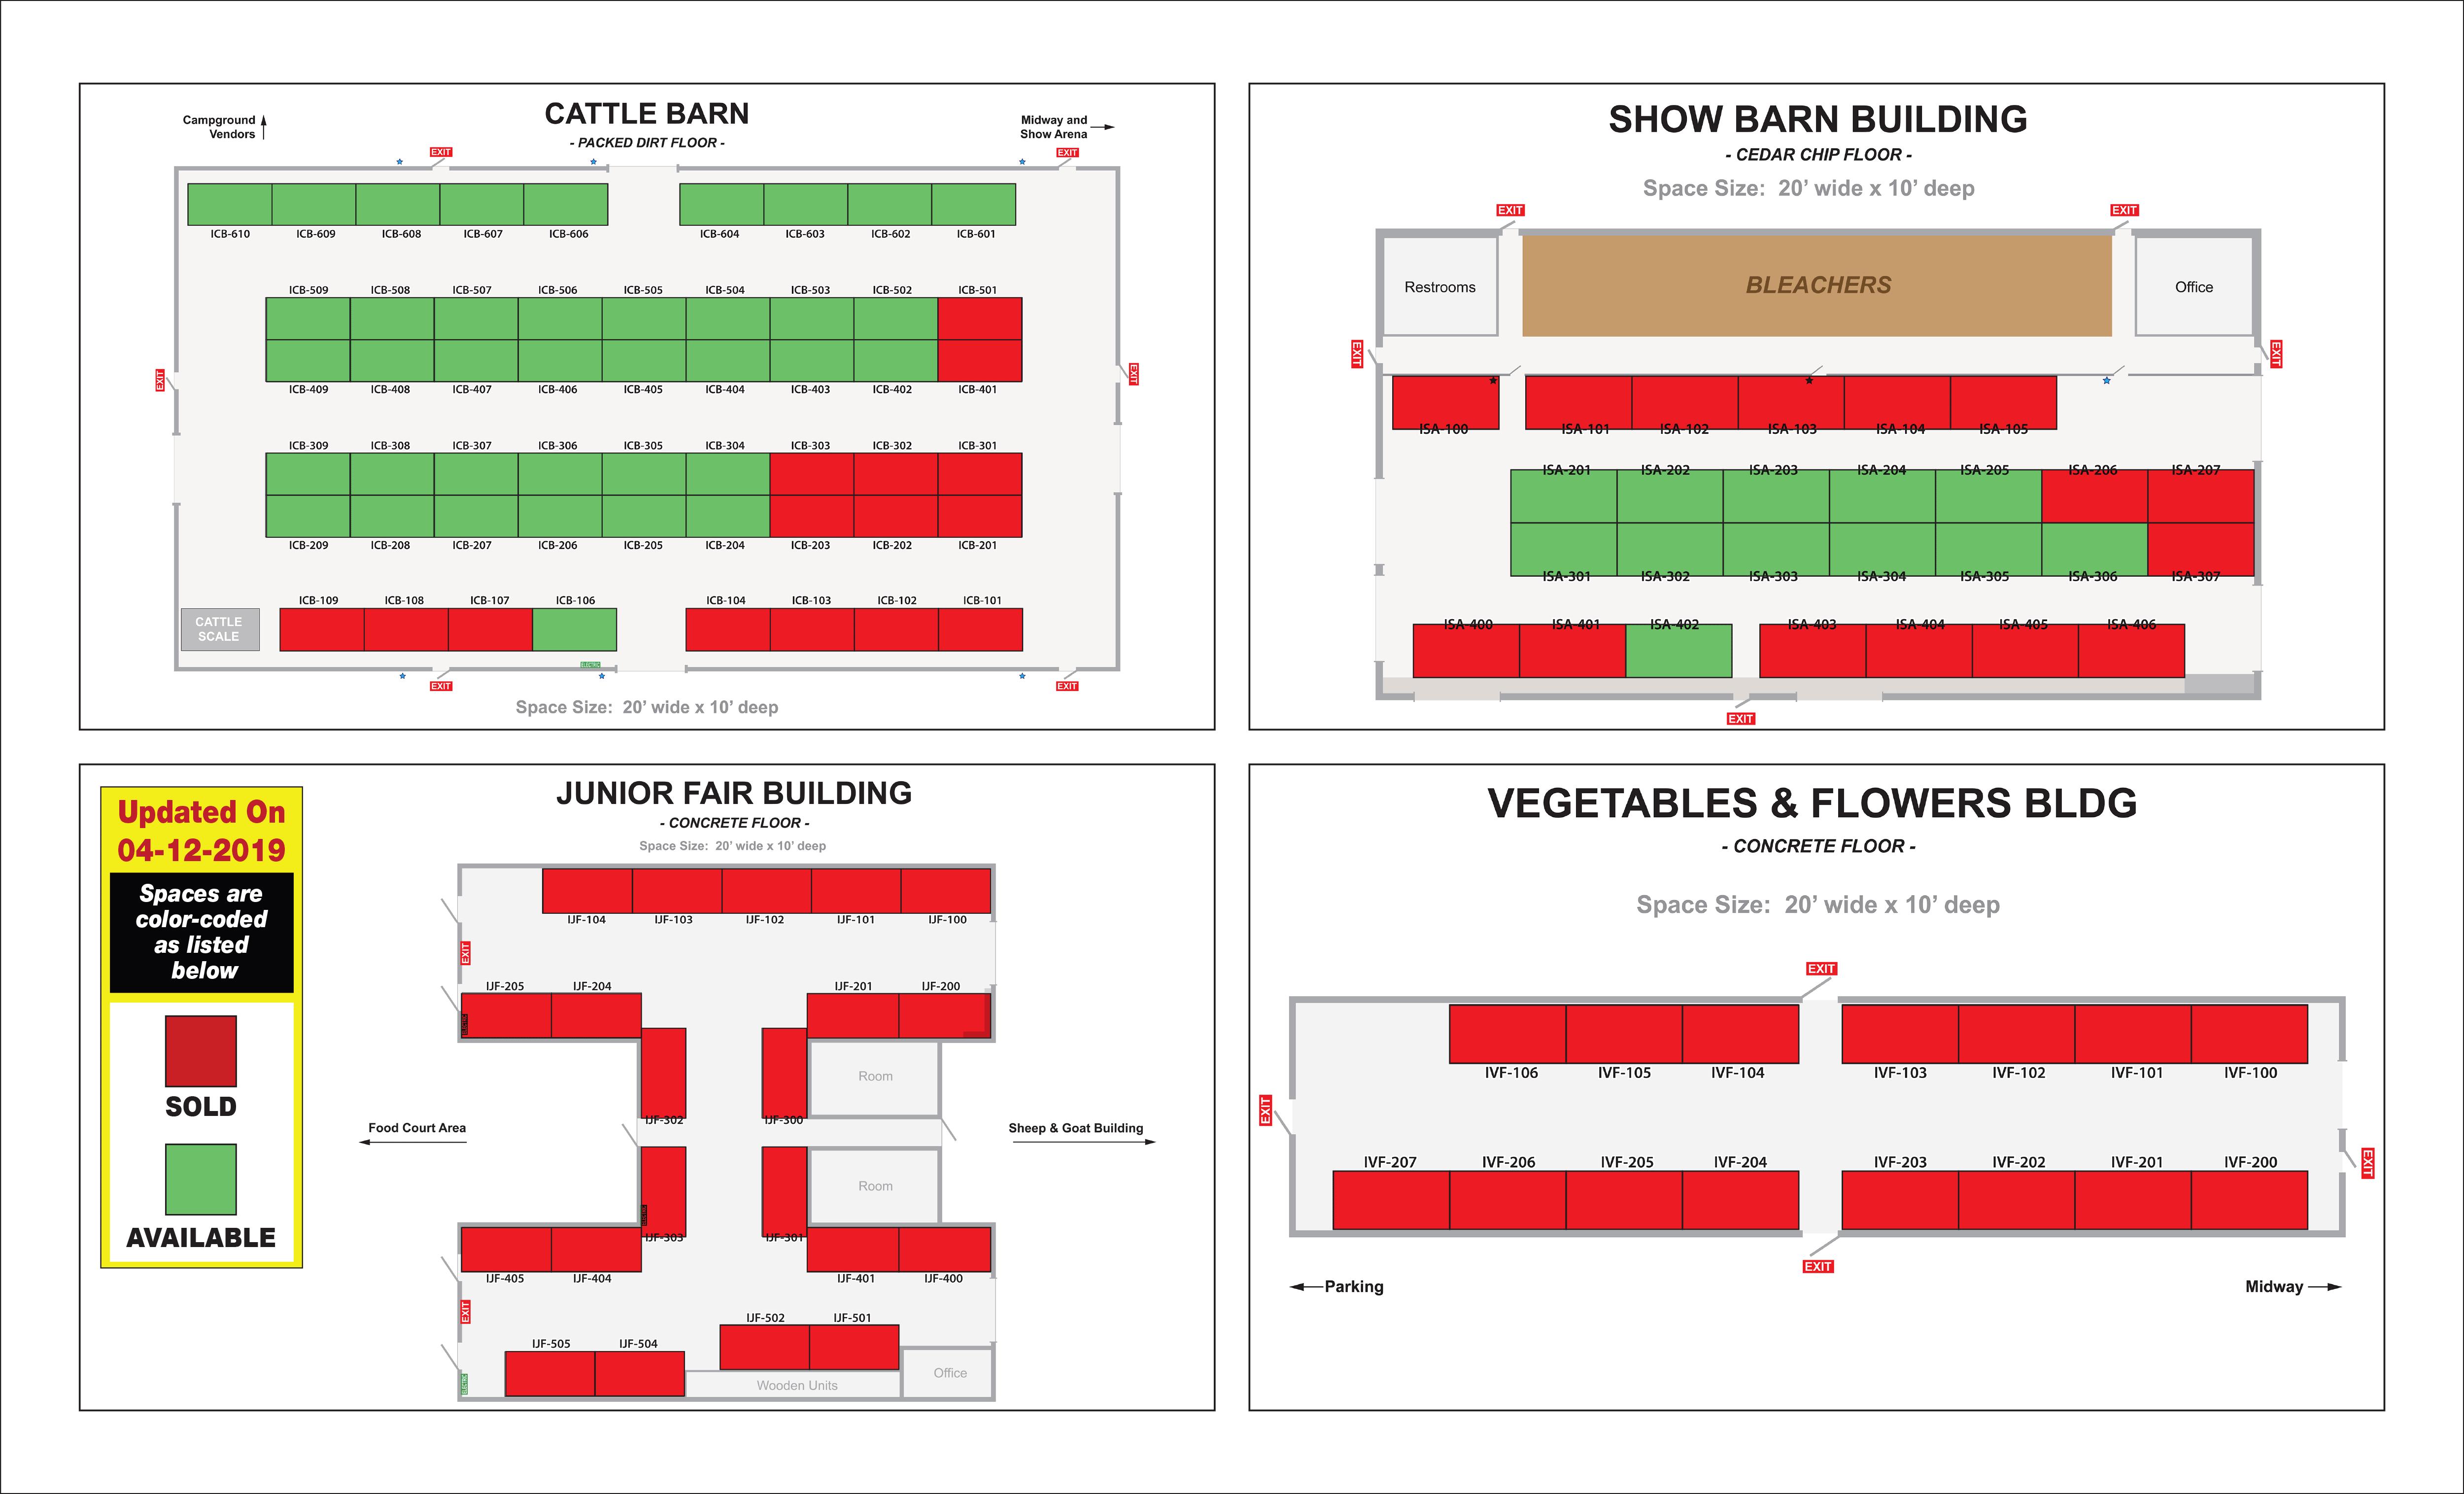 Indoor Vendor Map Availability